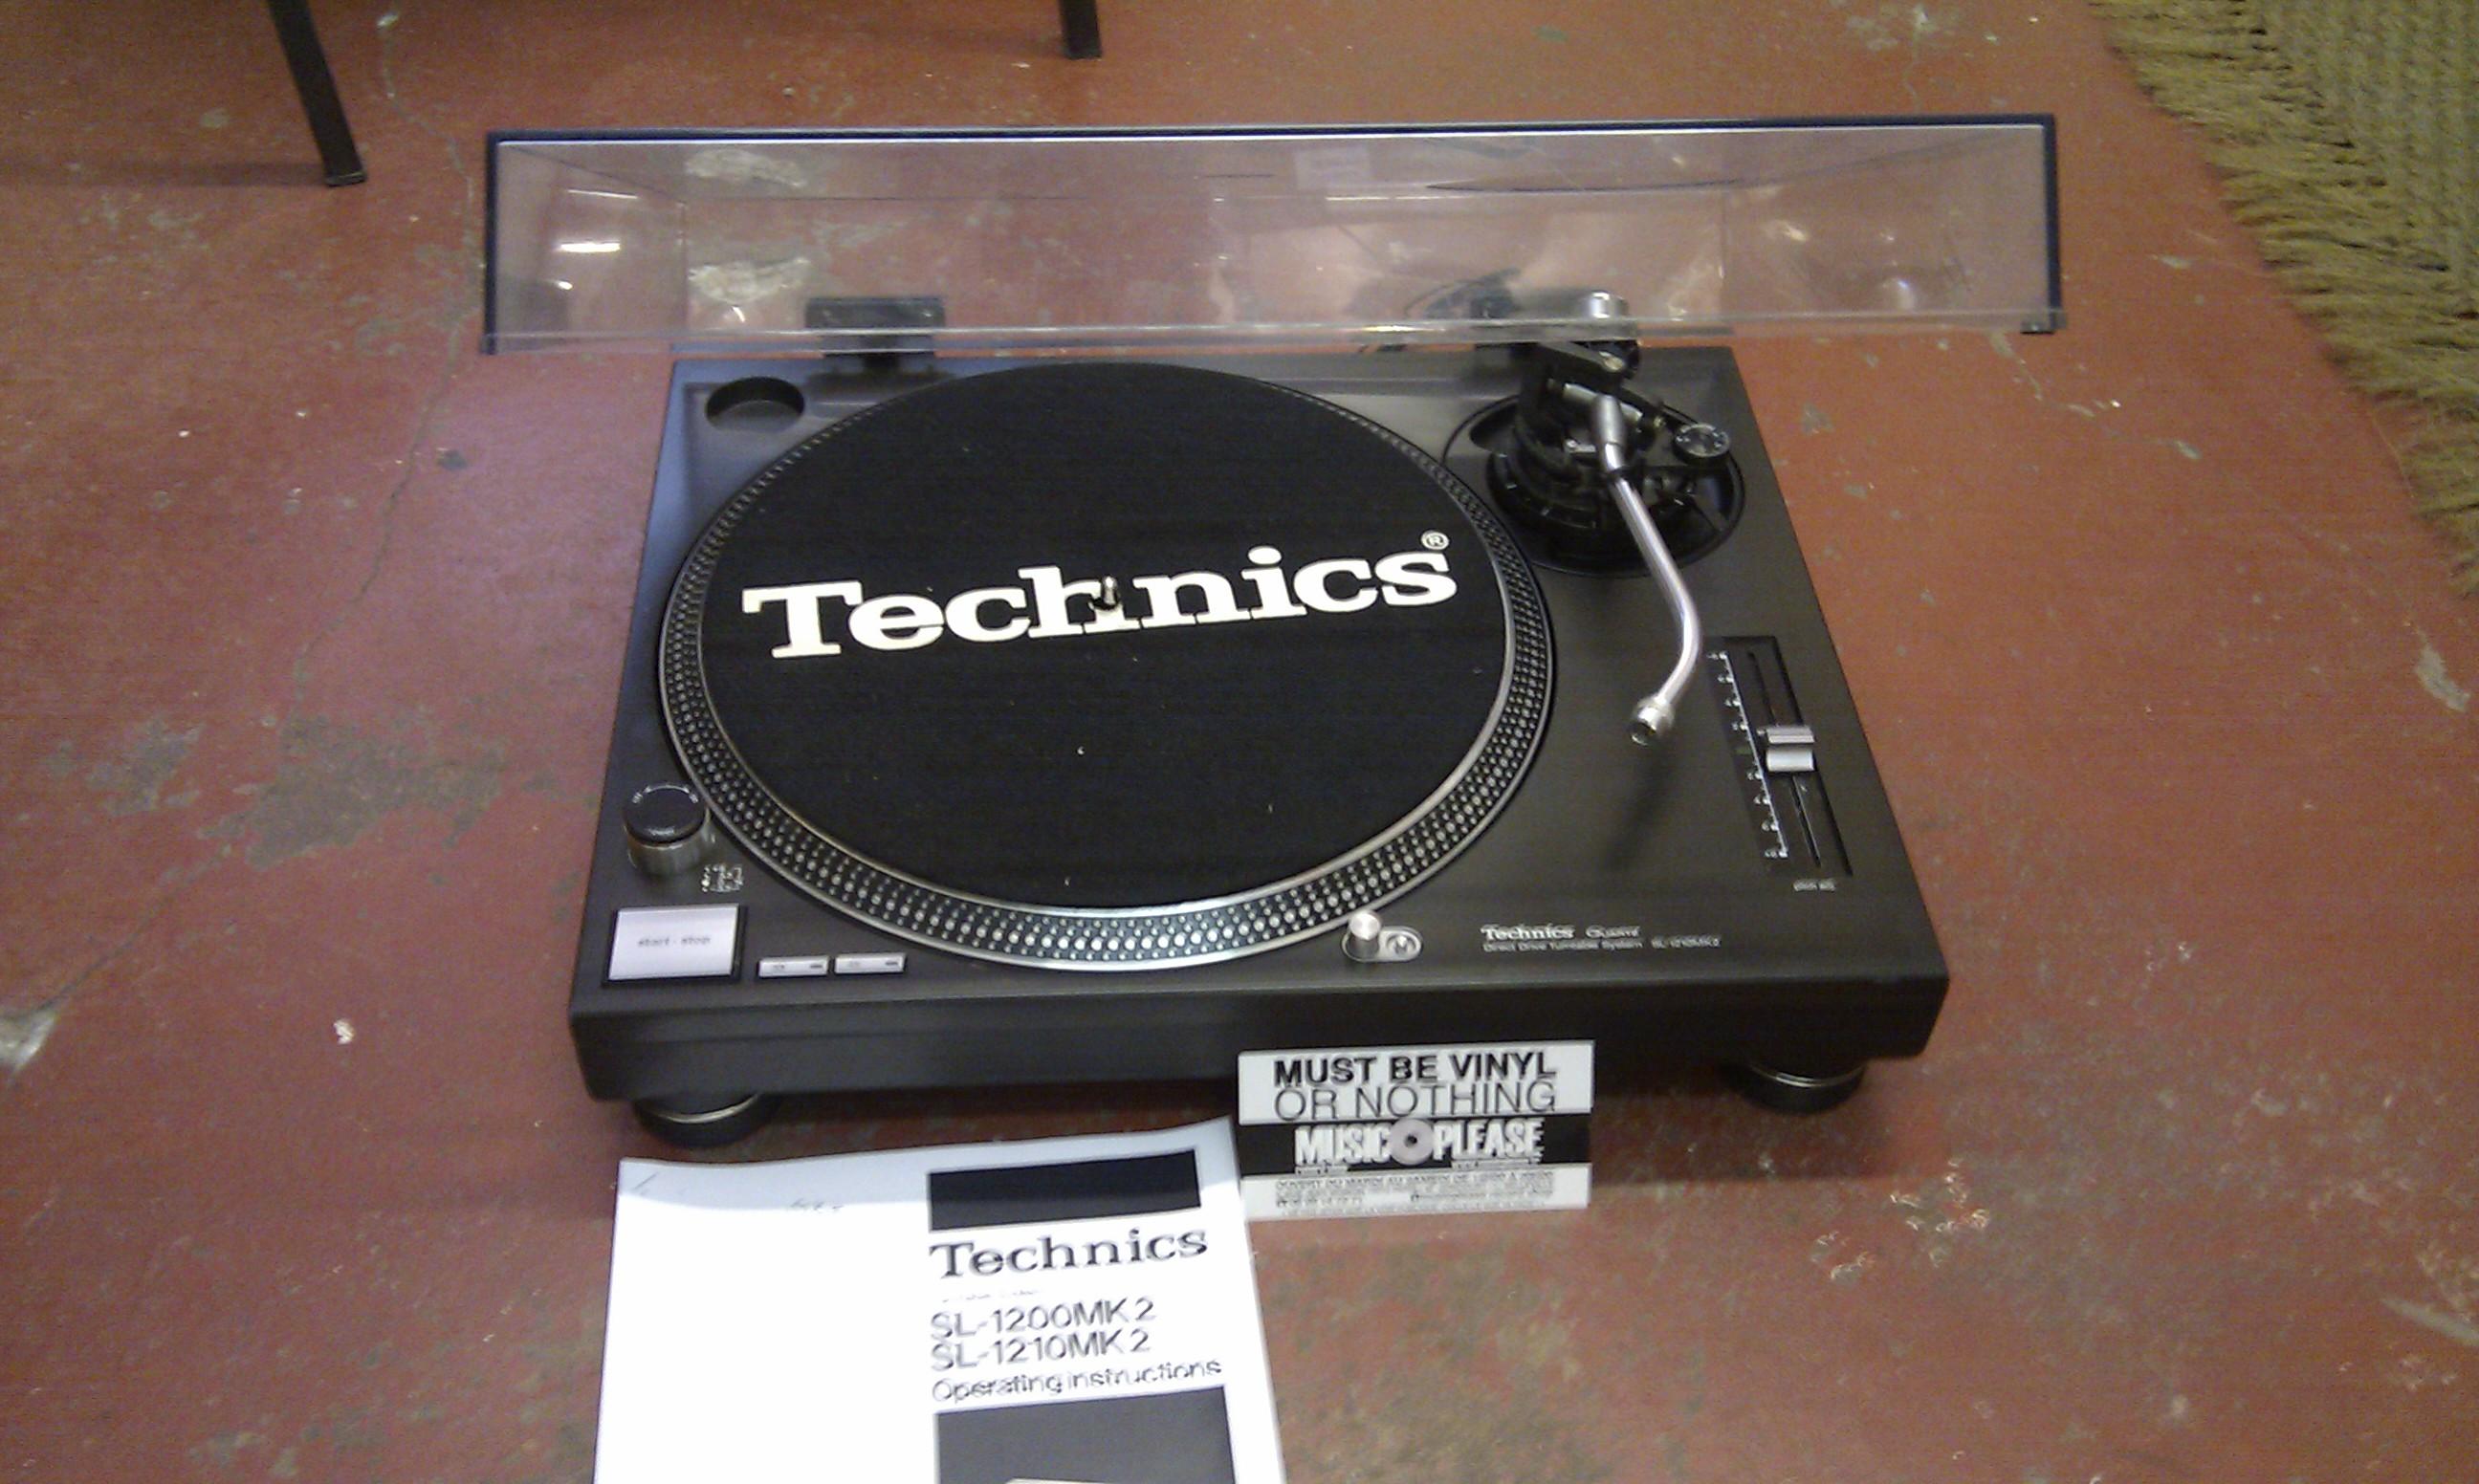 technics sl 1200 mk2 image 375210 audiofanzine. Black Bedroom Furniture Sets. Home Design Ideas